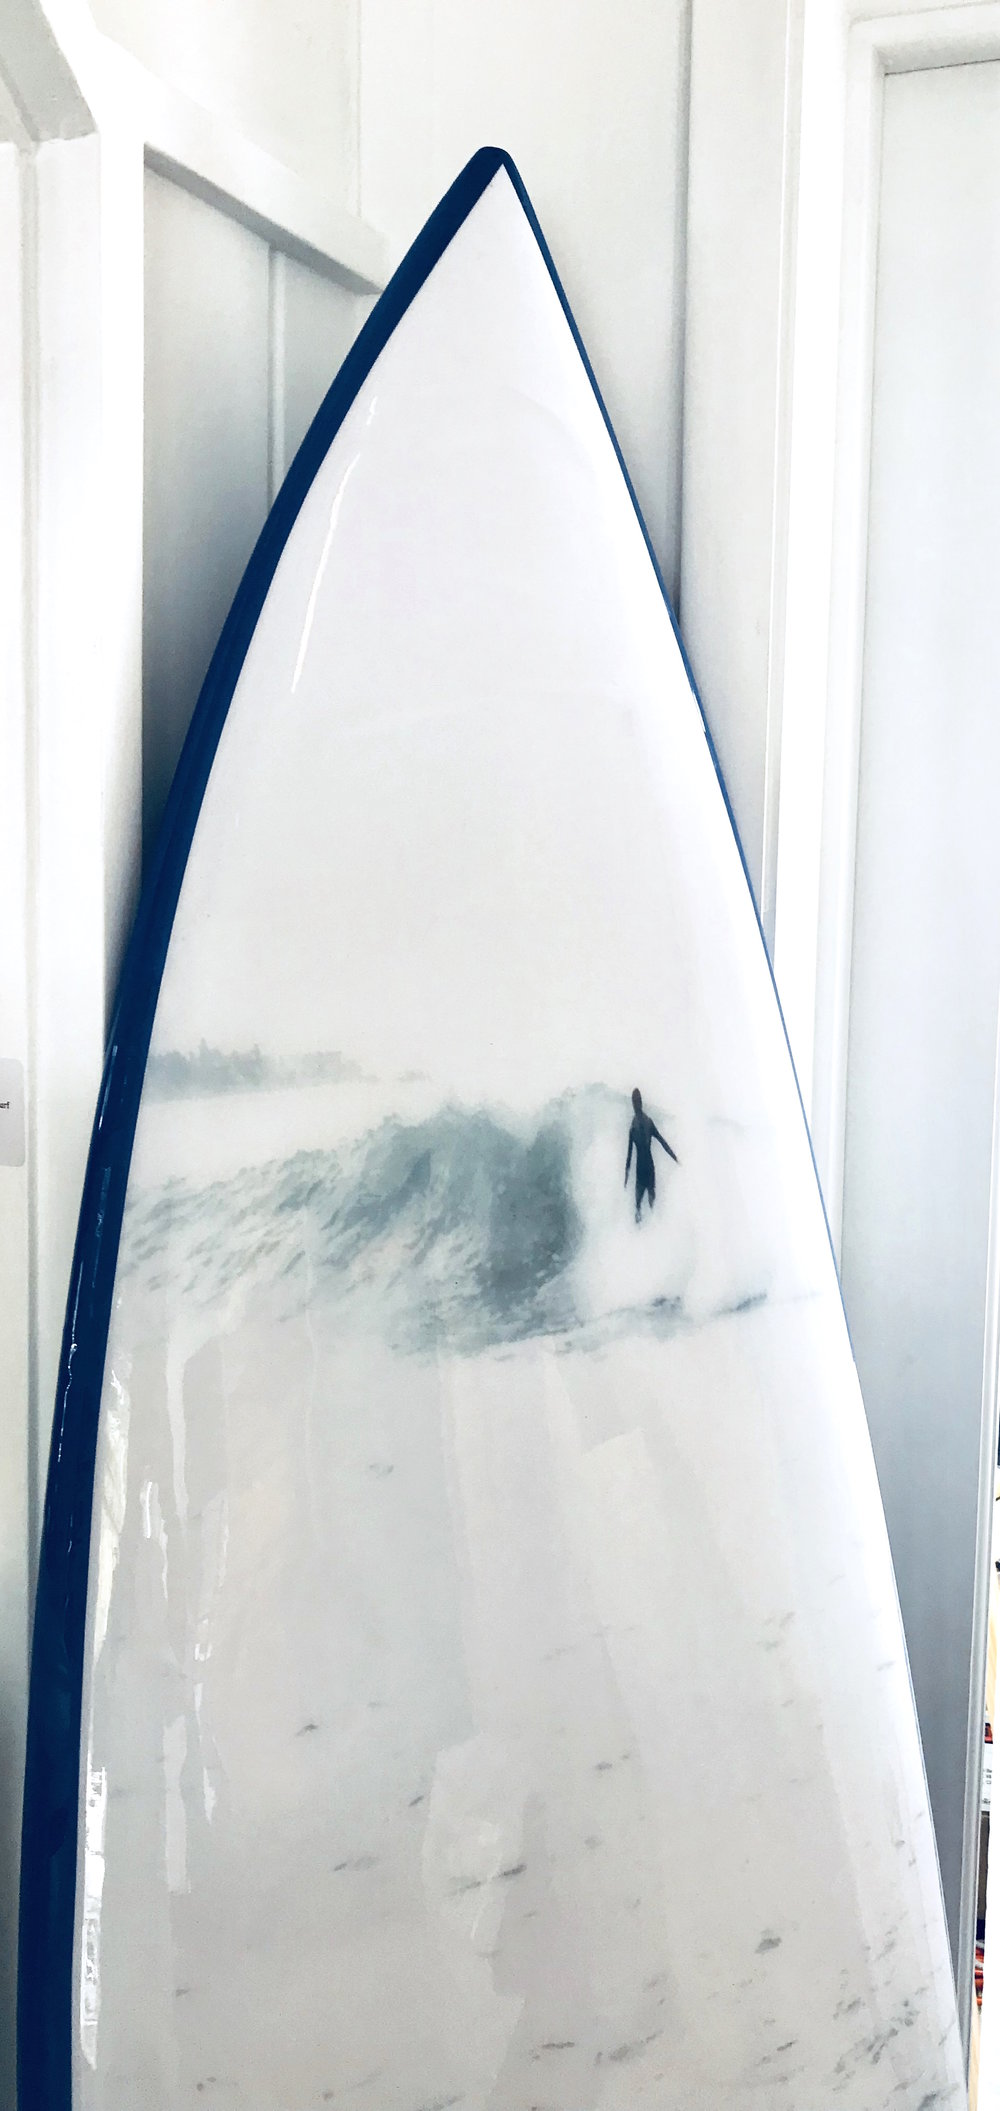 Surfboard Rincon verticle detail.jpg